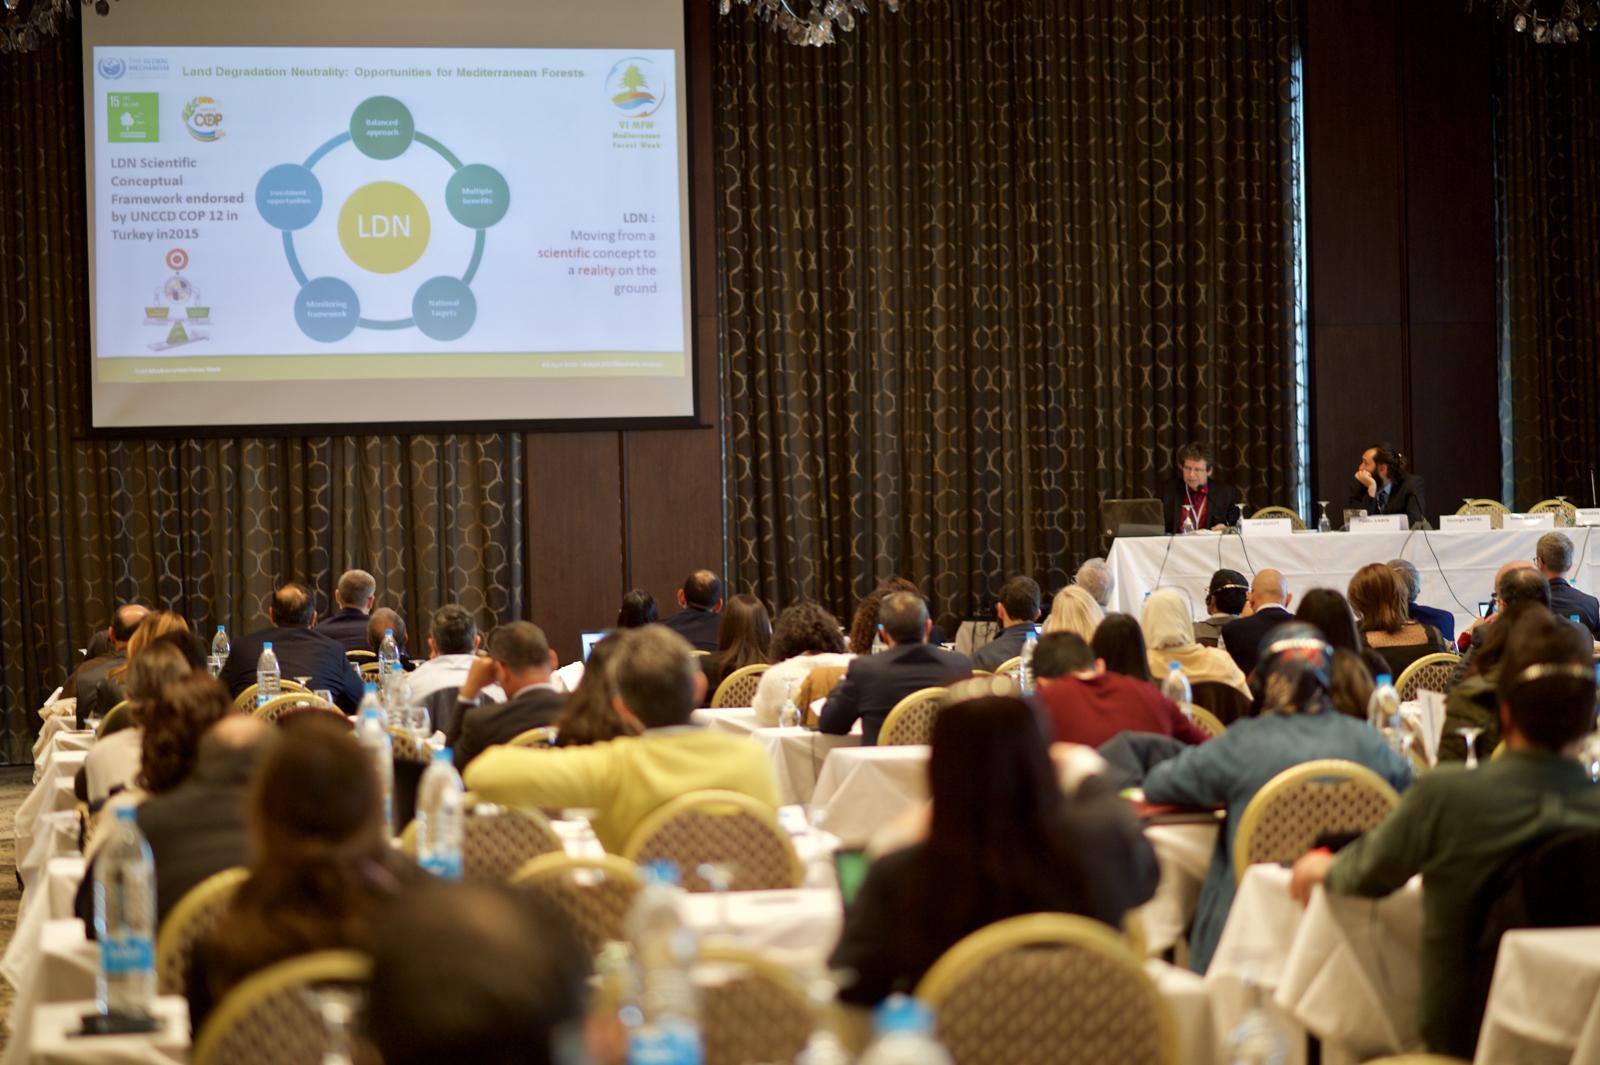 #MedForest week 2019 - Plenary session 1